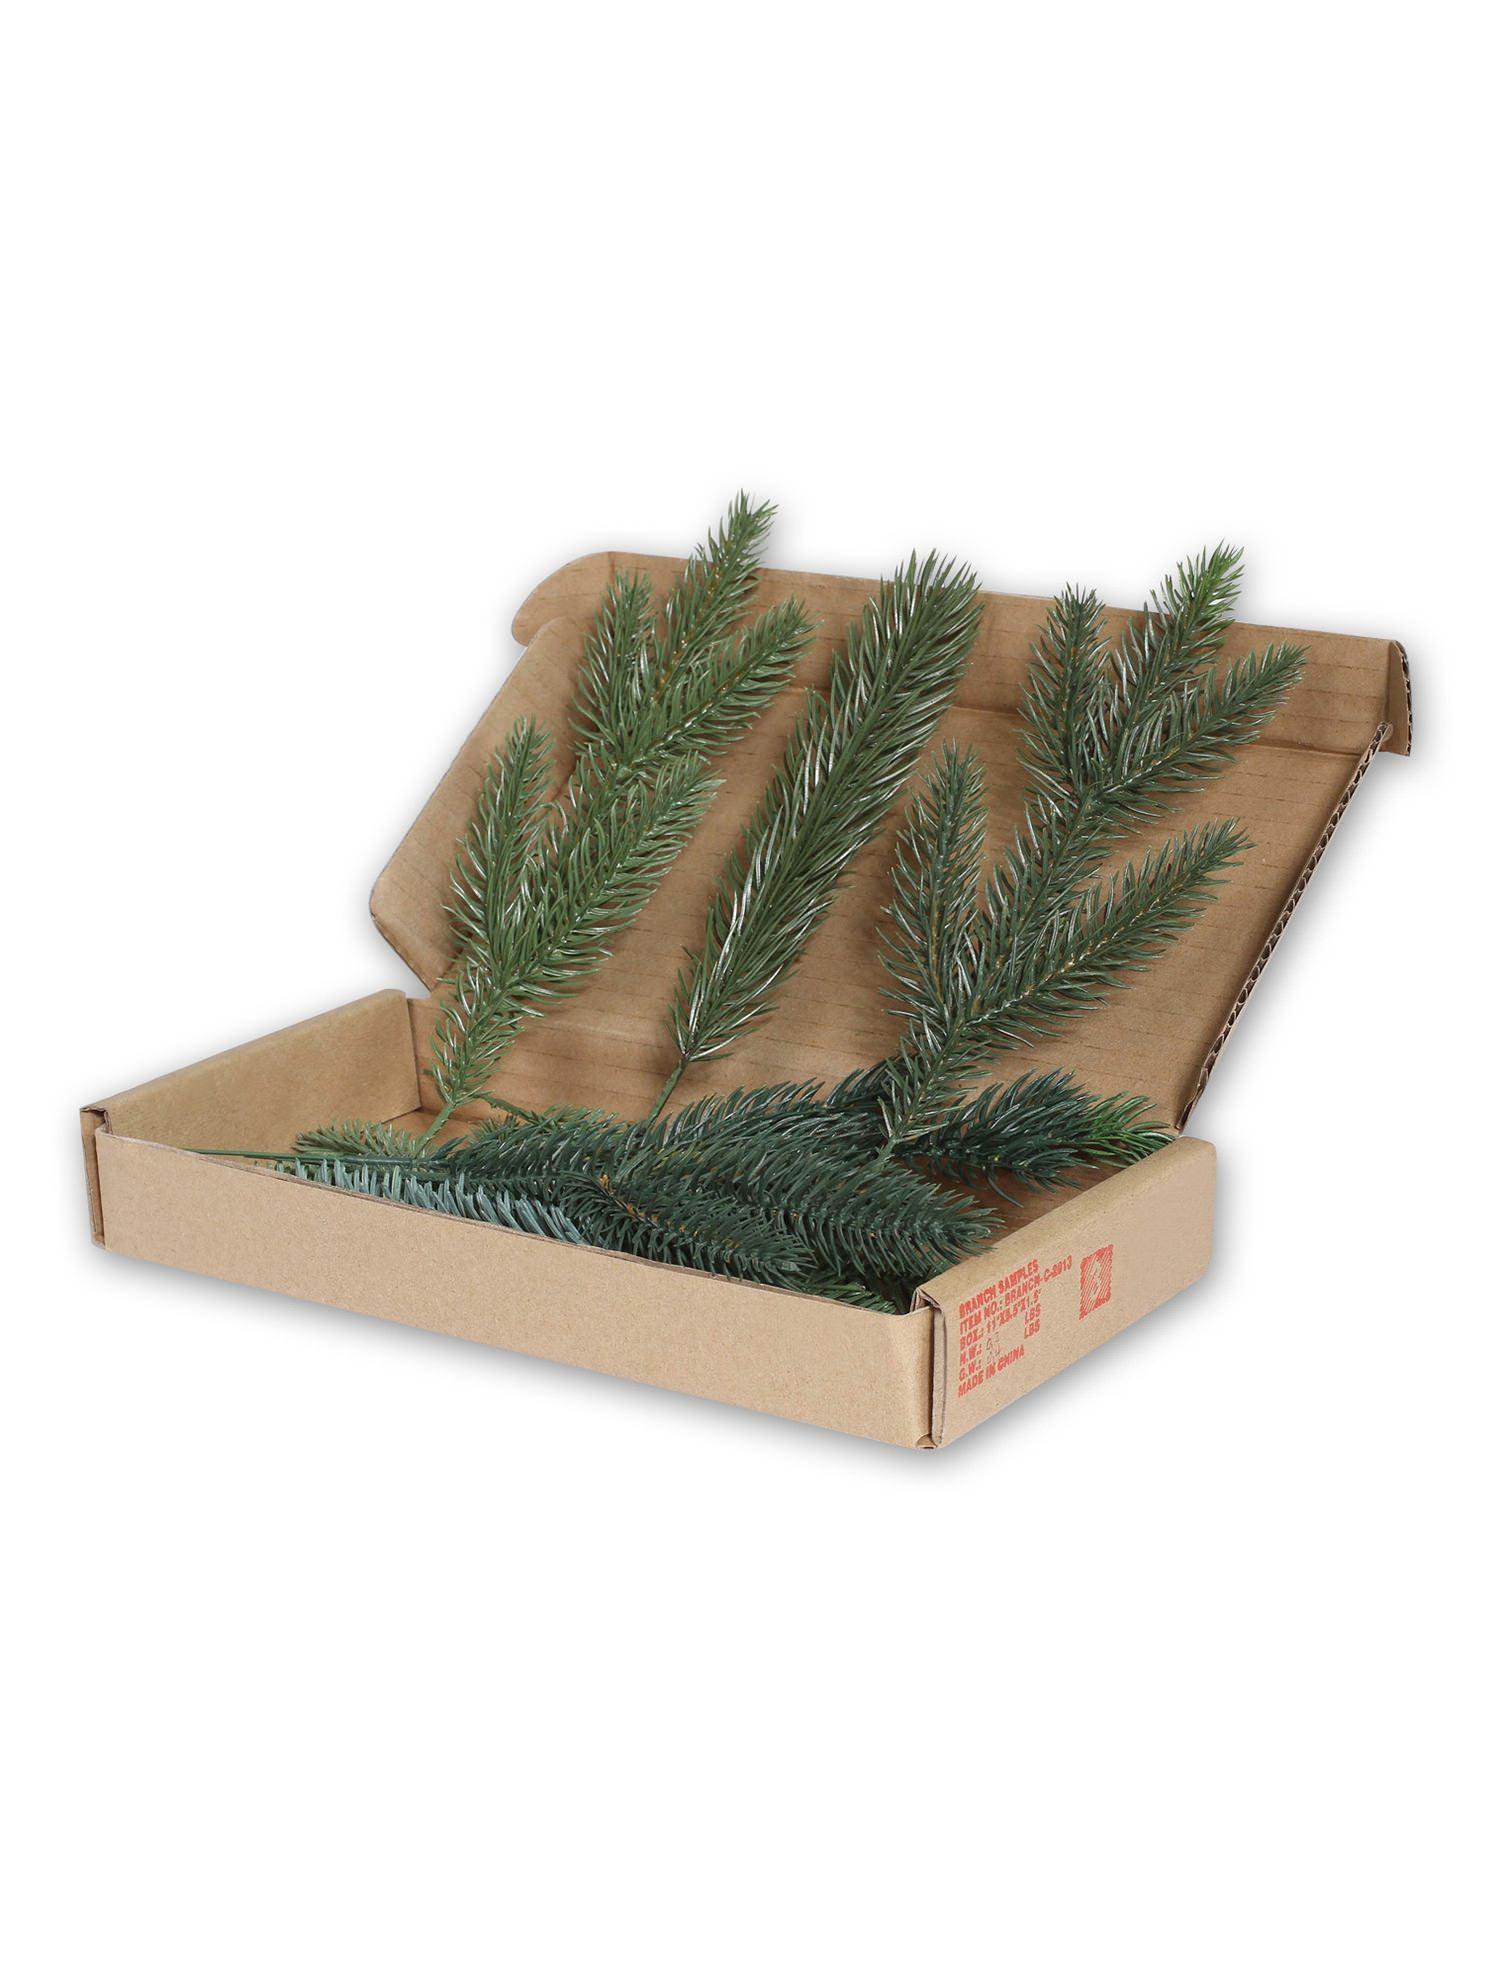 Balsam Hill Small Branch Sample Kit